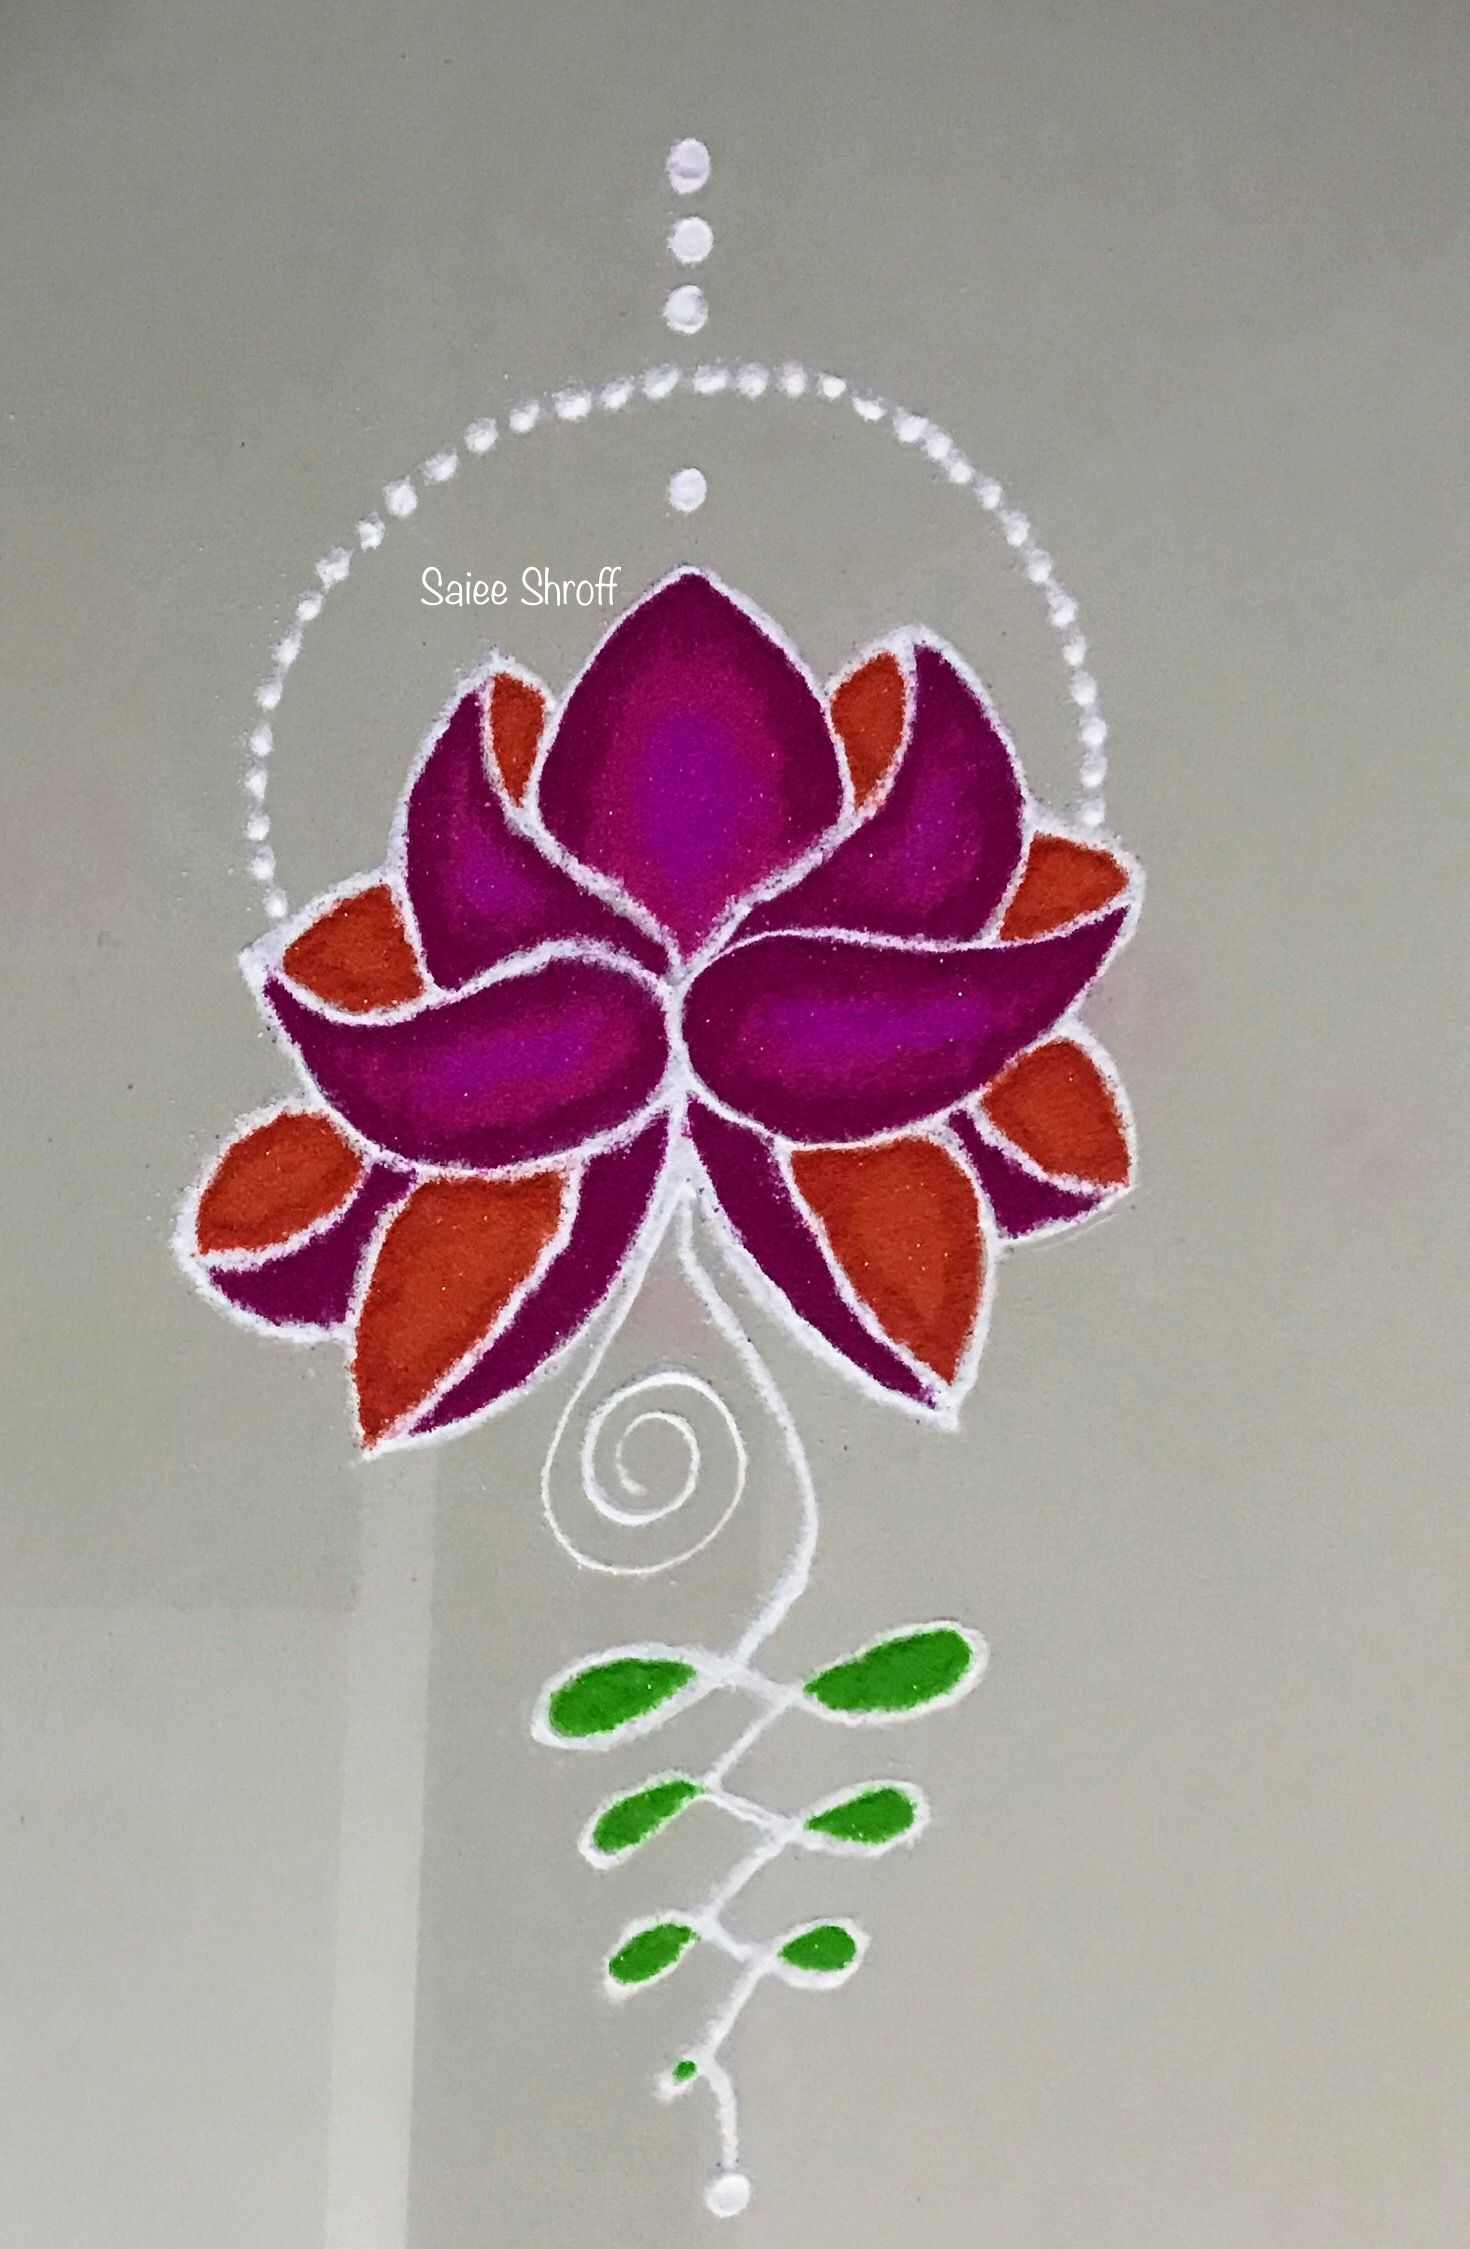 Lotus rangoli in 2020 Colorful rangoli designs, Flower